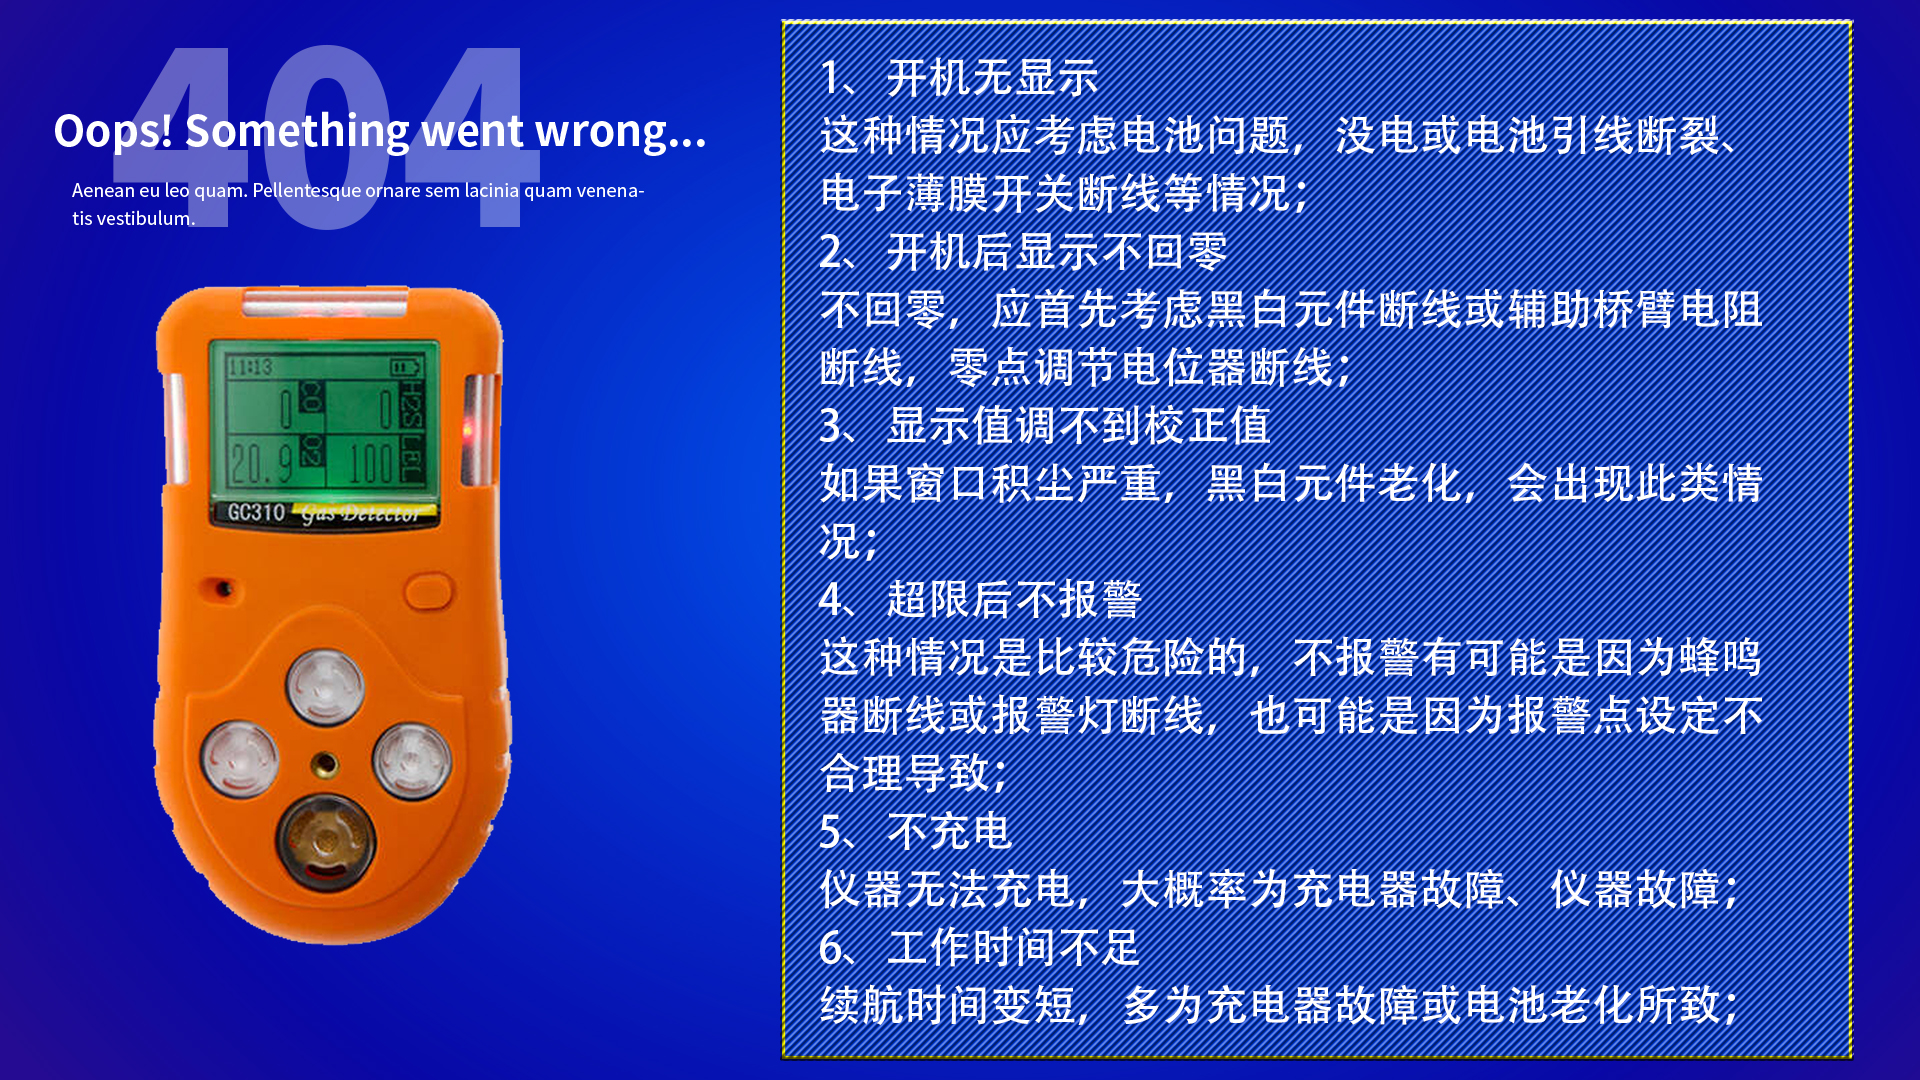 beplay手机下载电气便携式beplay手机客户端下载报警器常见故障原因分析